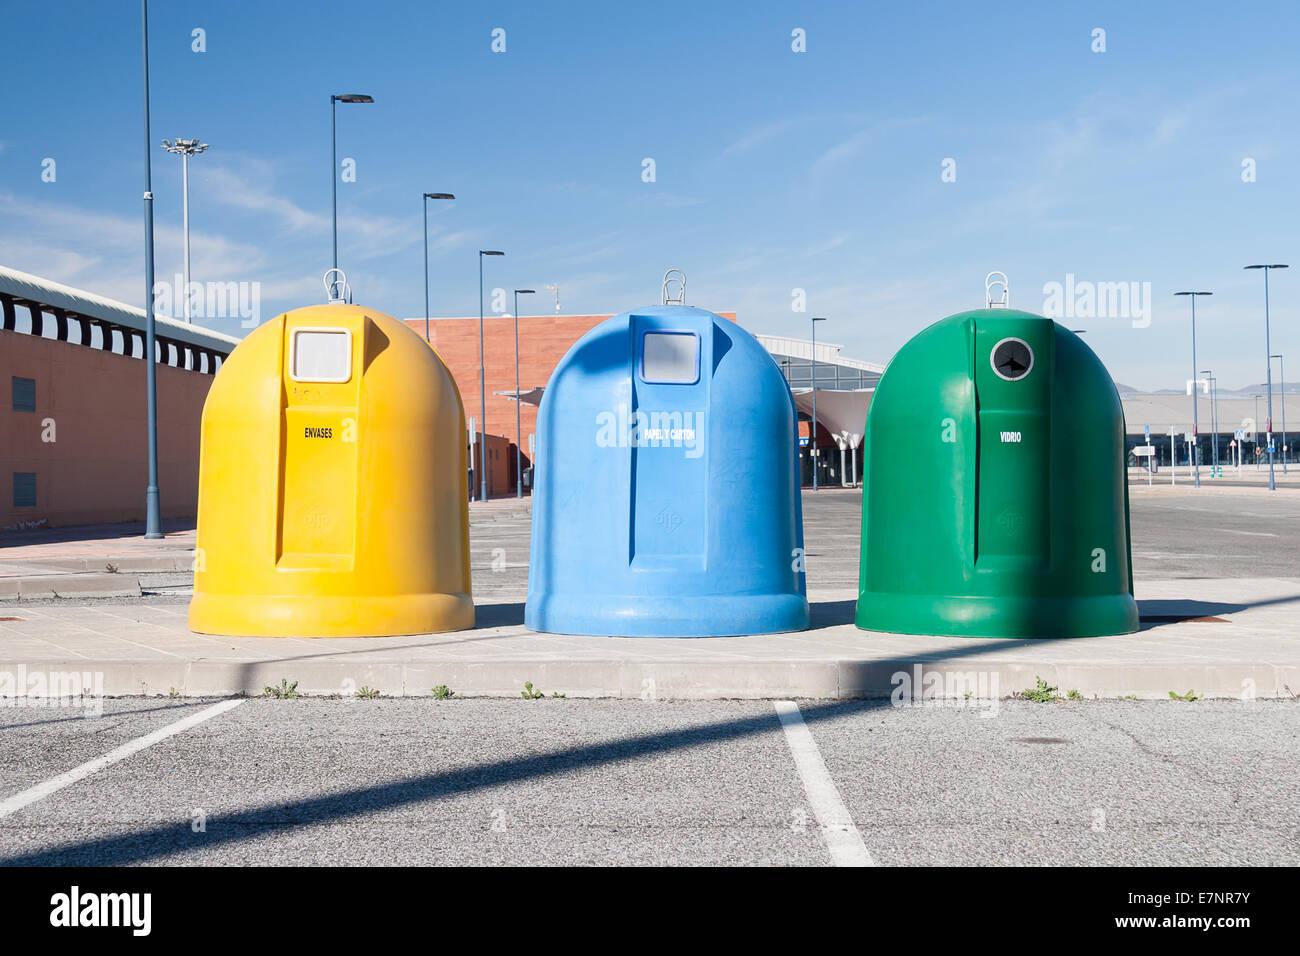 Contenedores de basura Imagen De Stock